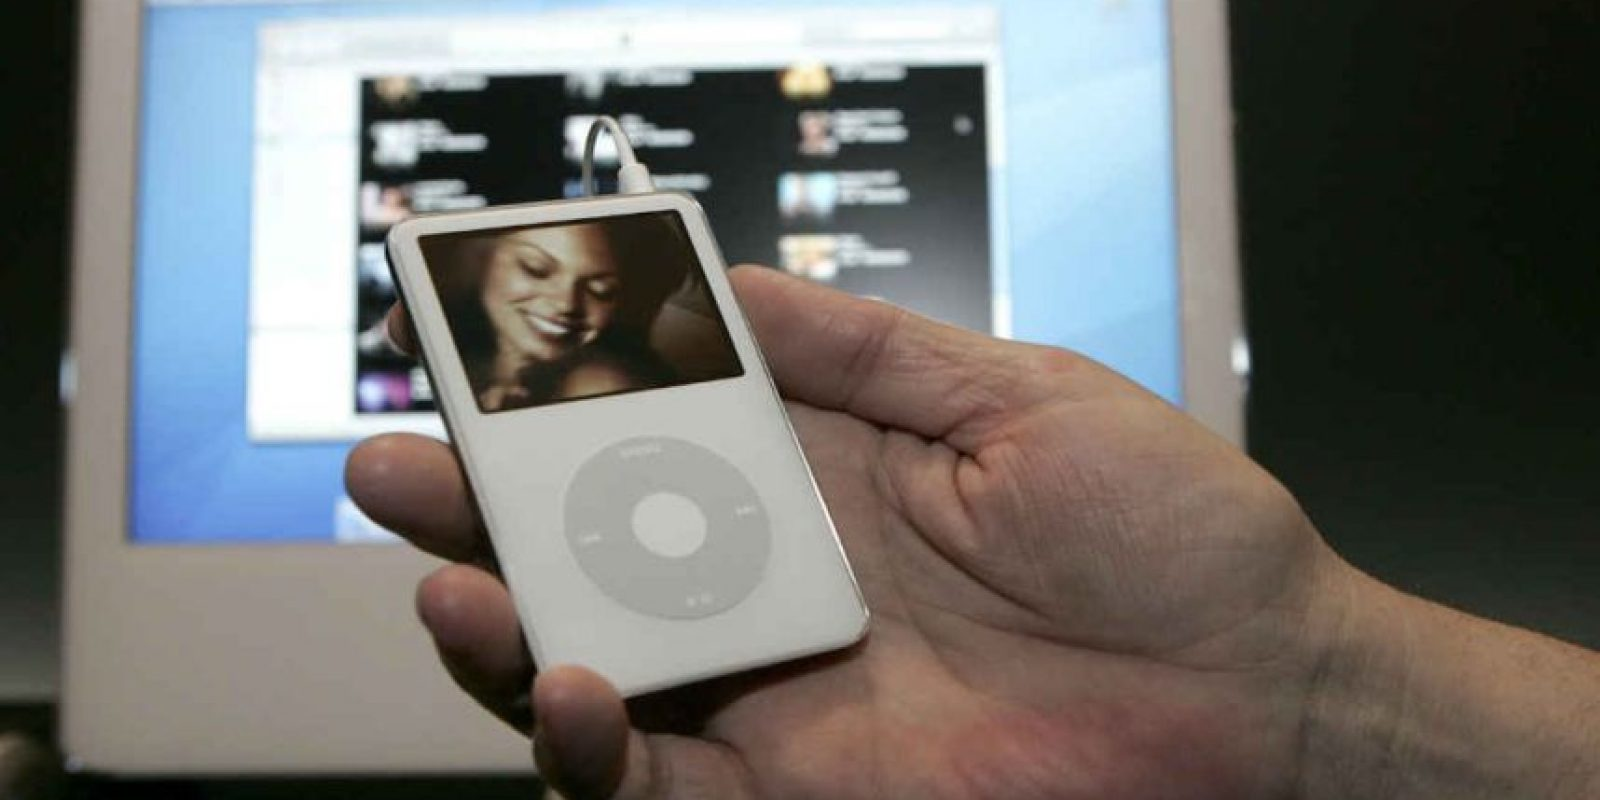 En 2005 se lanzó el iPod mini, el primero en colores diferentes. Foto:Getty Images